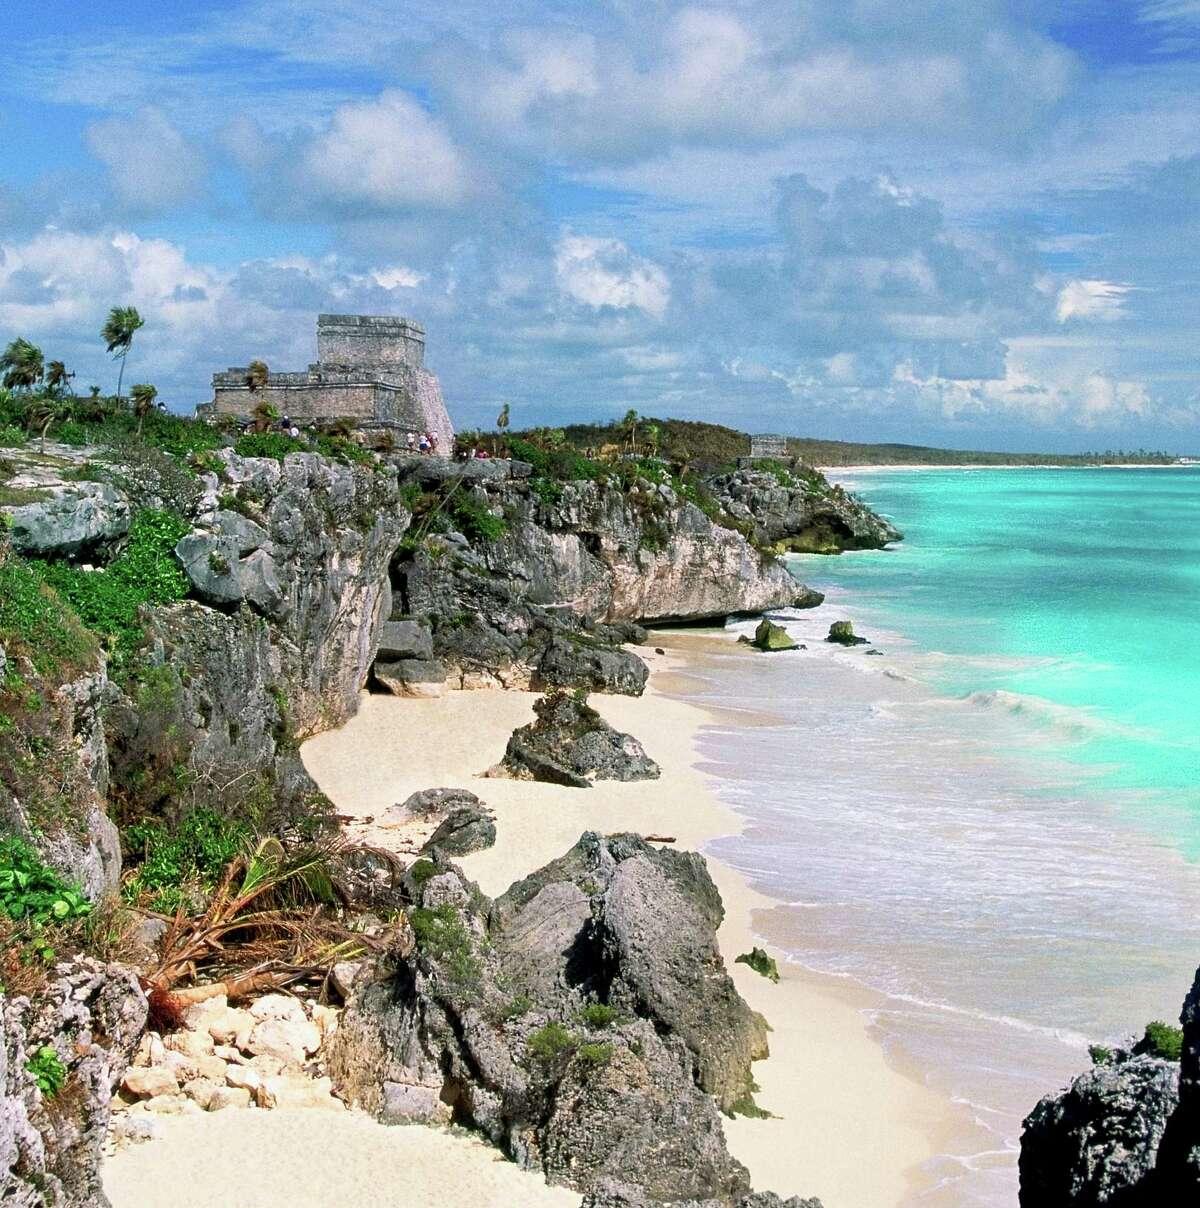 Tulum,Quintana Roo Level 2 warning Round trip: $519+